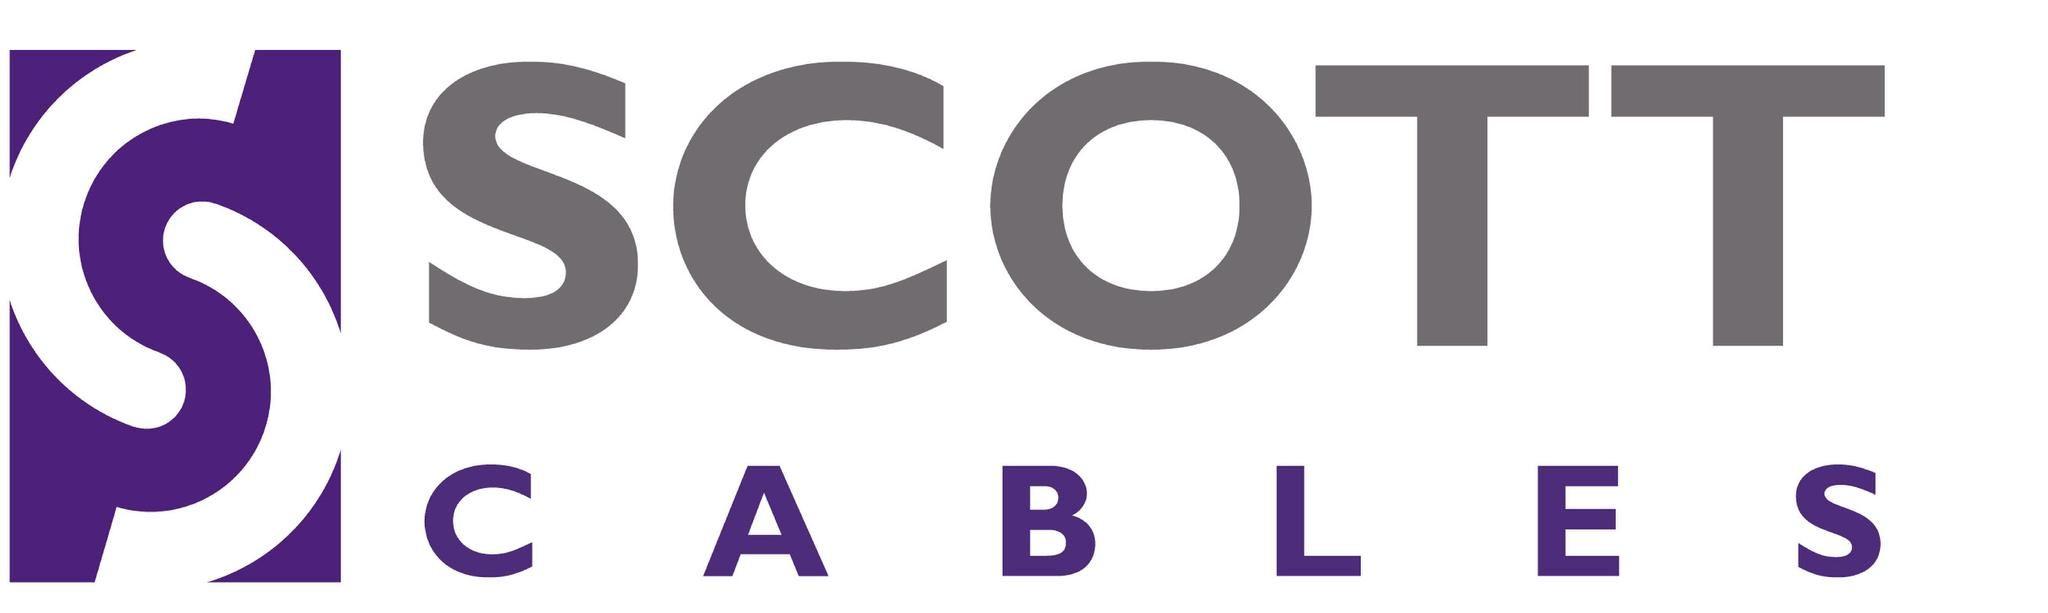 Scott Cables